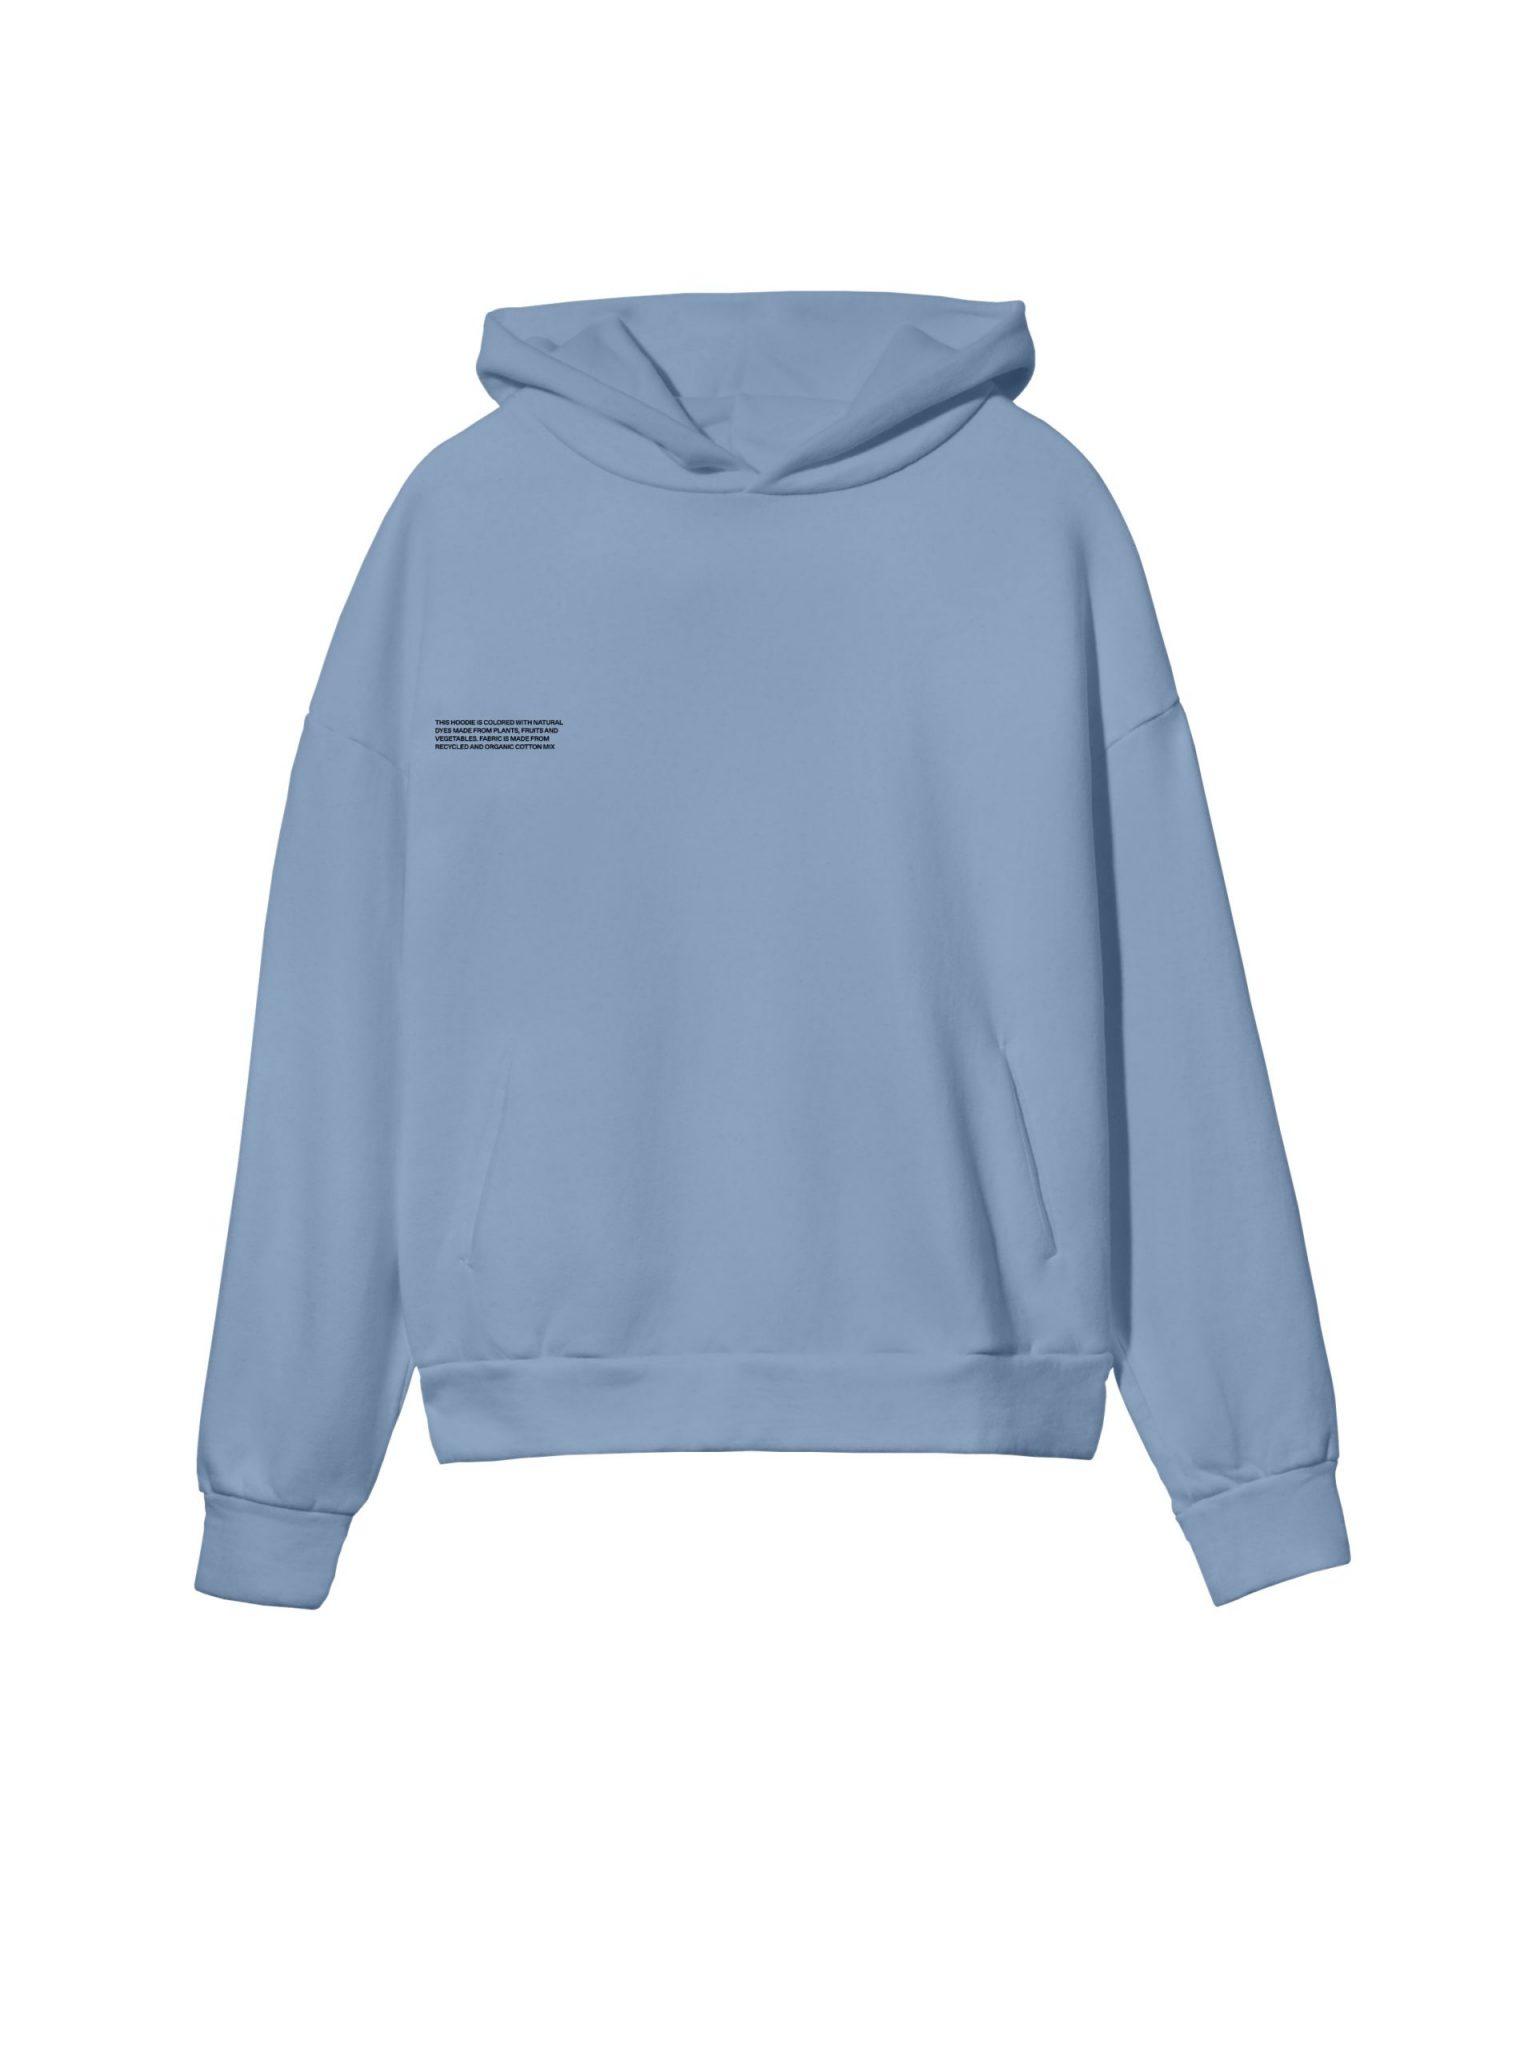 pangaia_still_life_blue_hoodie_front_botanical@3x